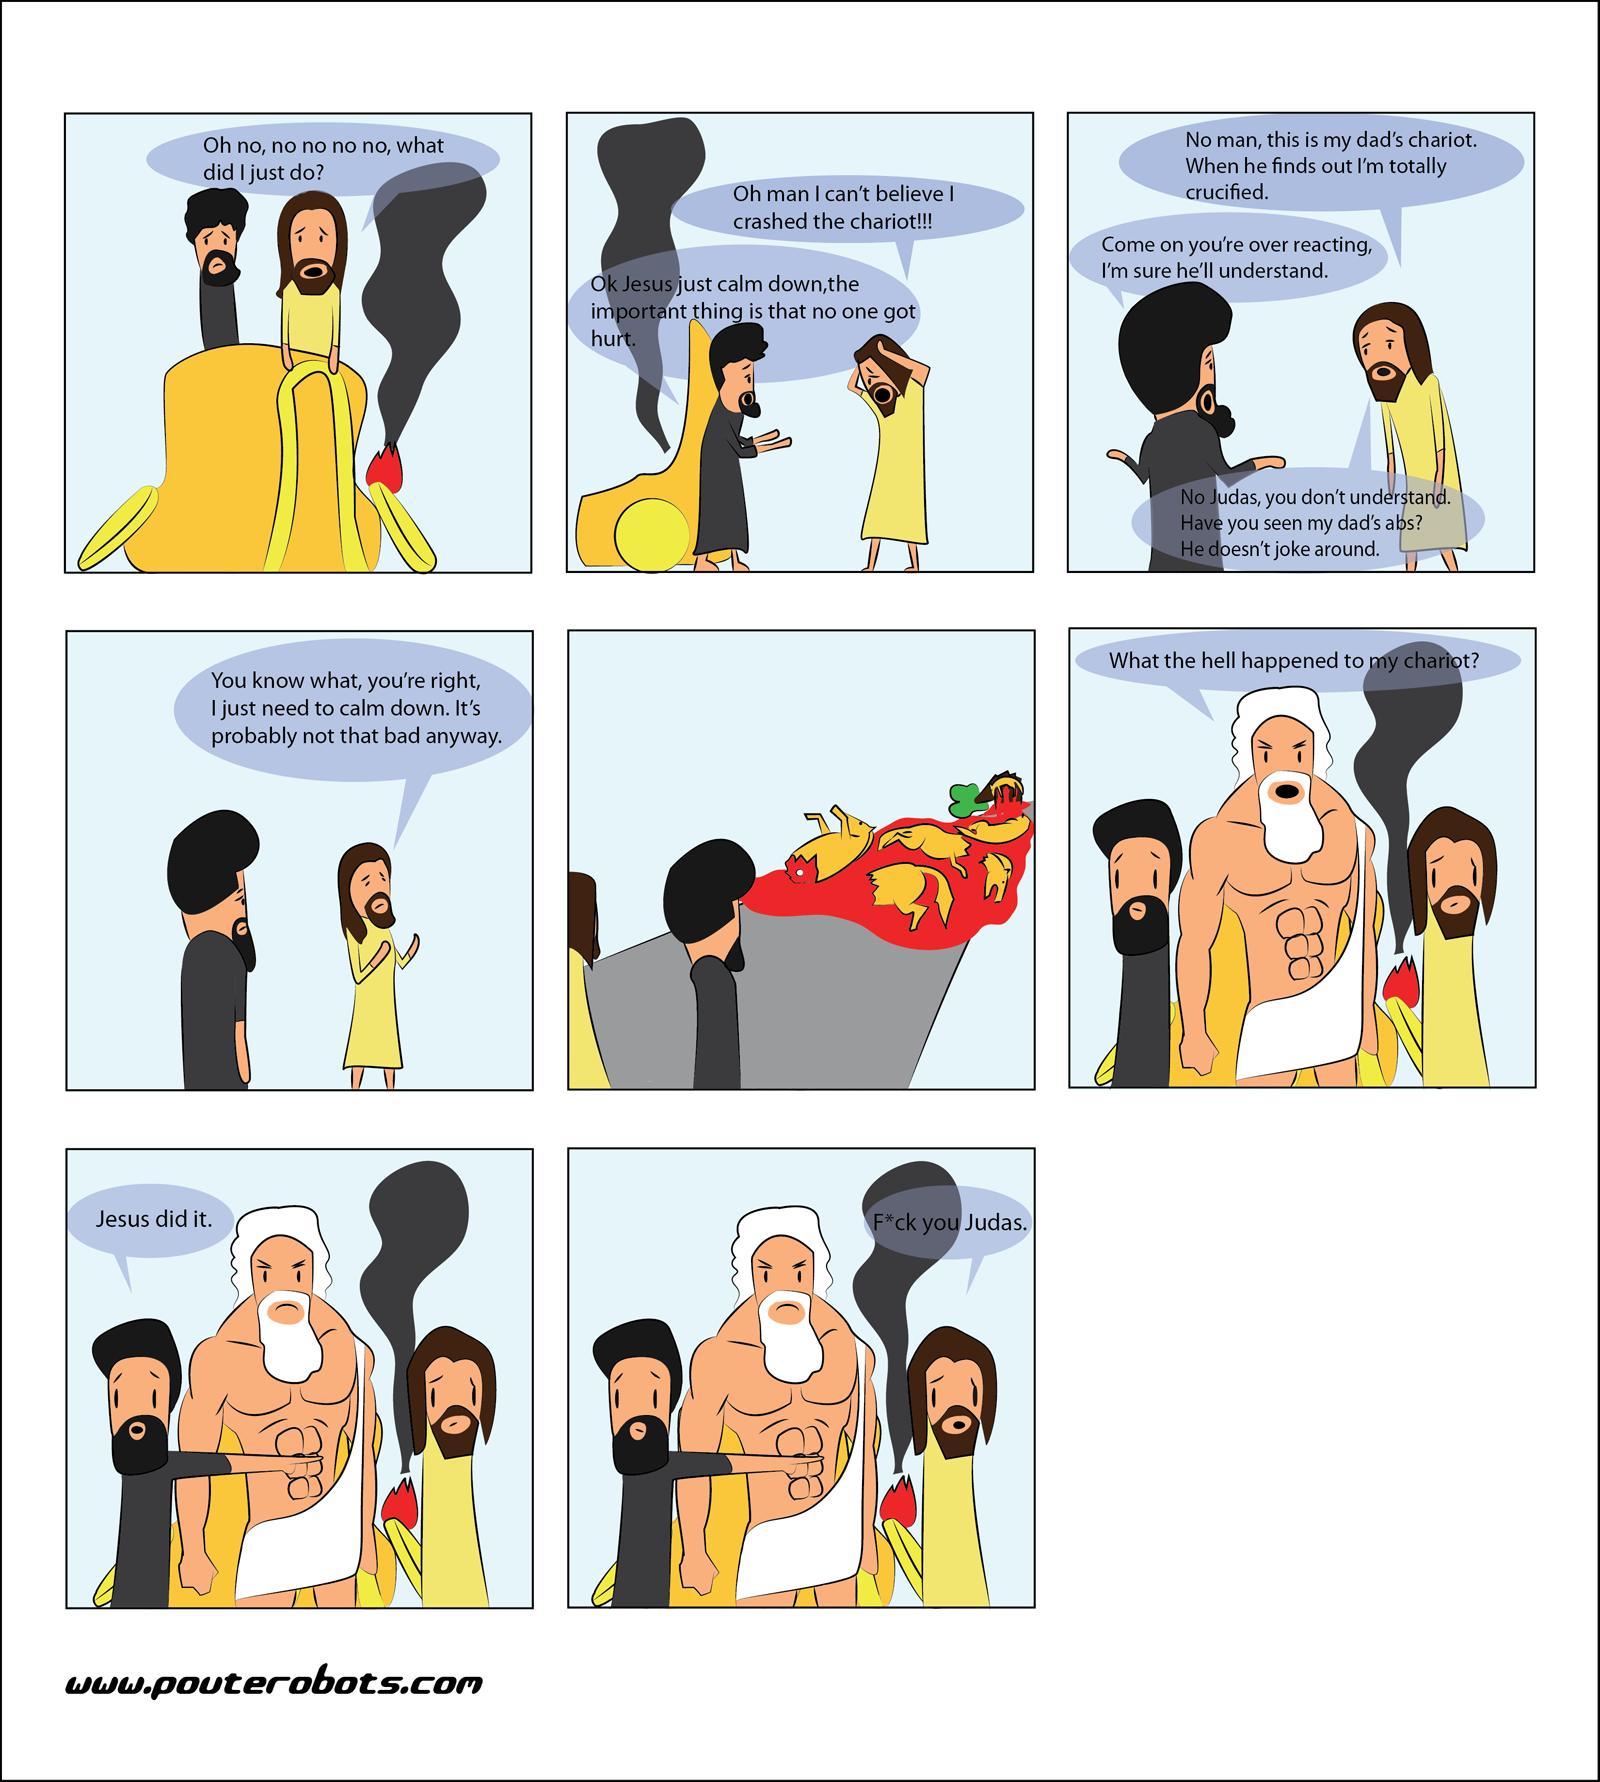 Chariot. .. wat. Zeus is Jesus' dad now? And Judas a brother? Mind - pain...